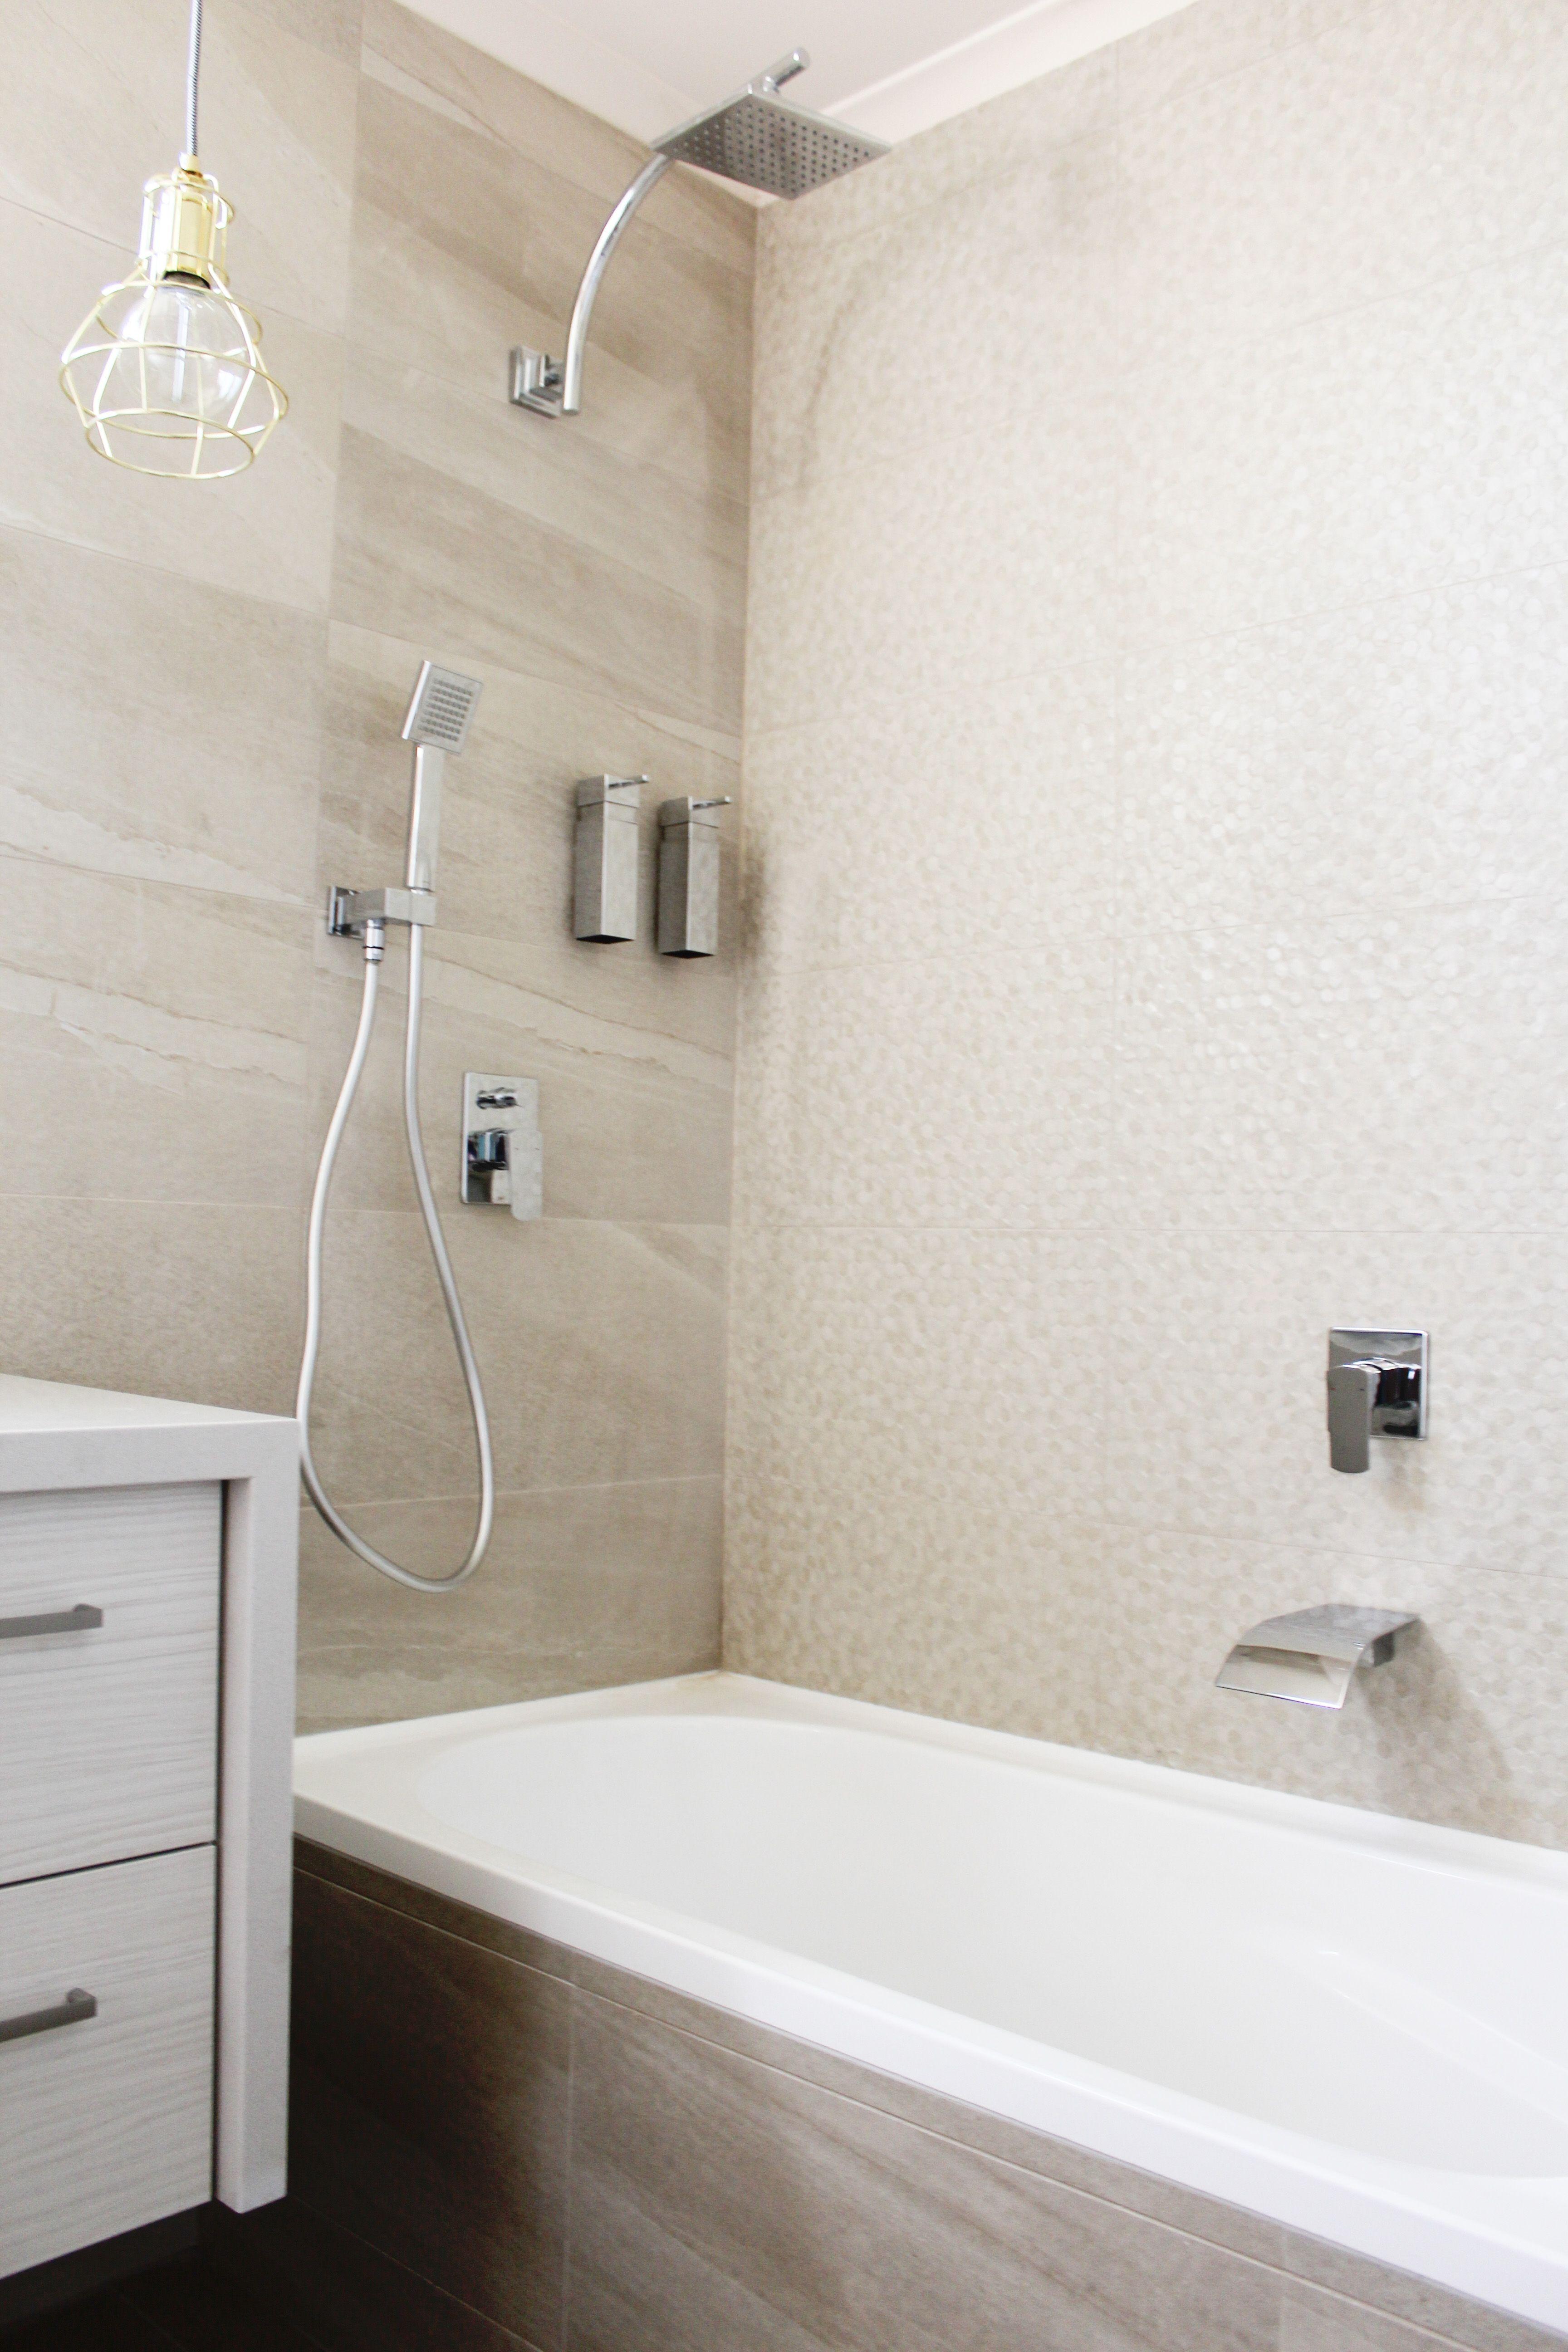 Shower Bath No Screen Bath Shower Over Bath Cream Modern Shower Over Bah Gosnells Bathroom Ren Shower Over Bath Bathroom Vanity Designs Bathroom Design